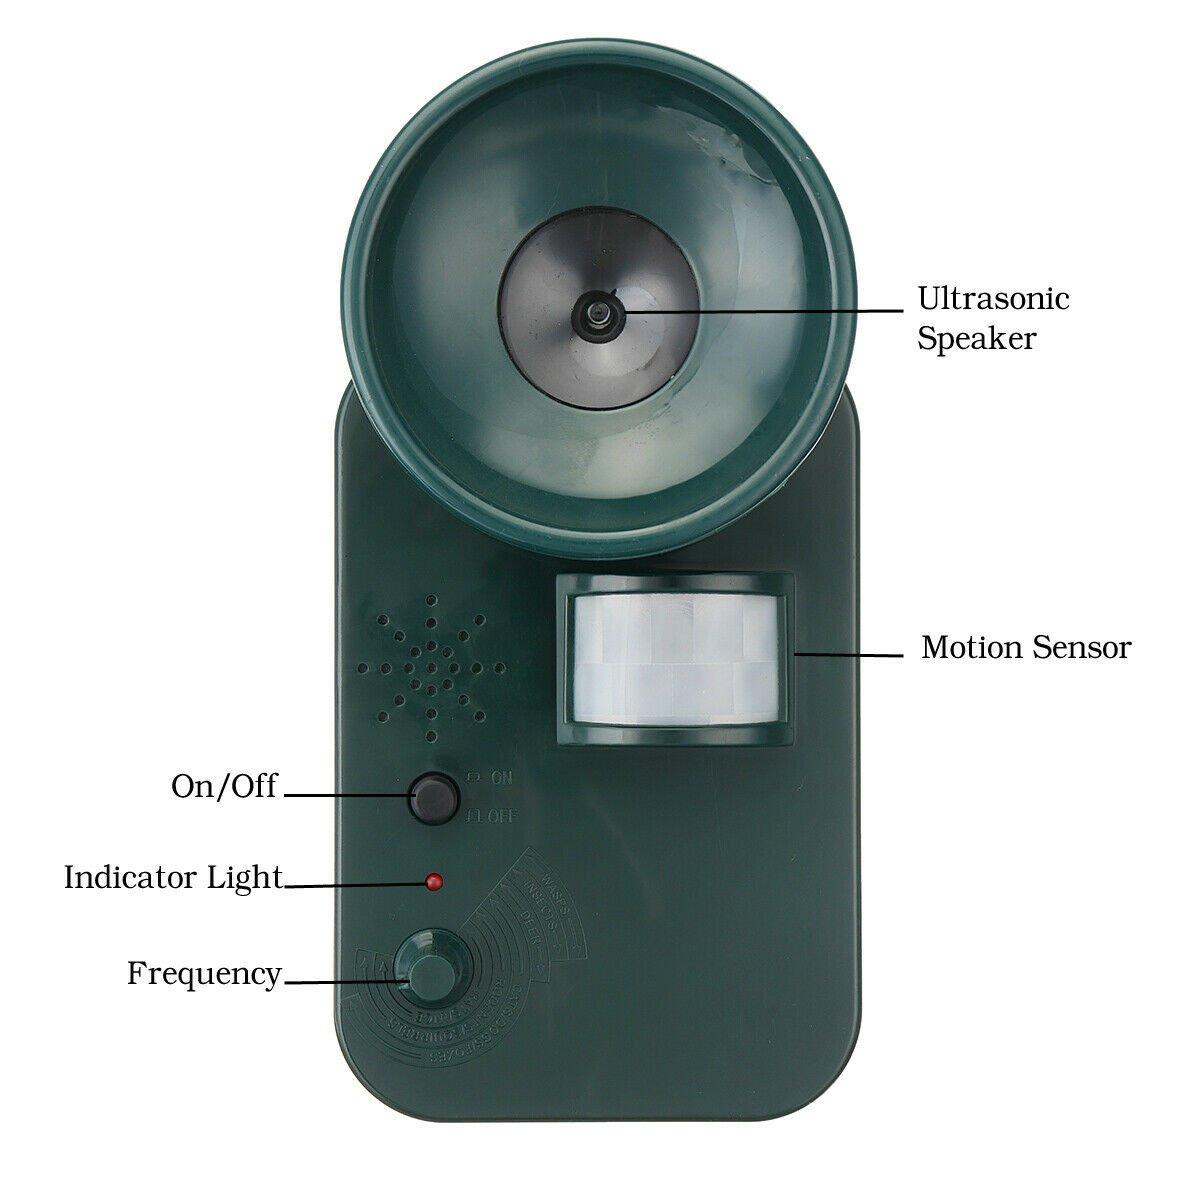 Ultrasonic Cordless Repeller Main 2